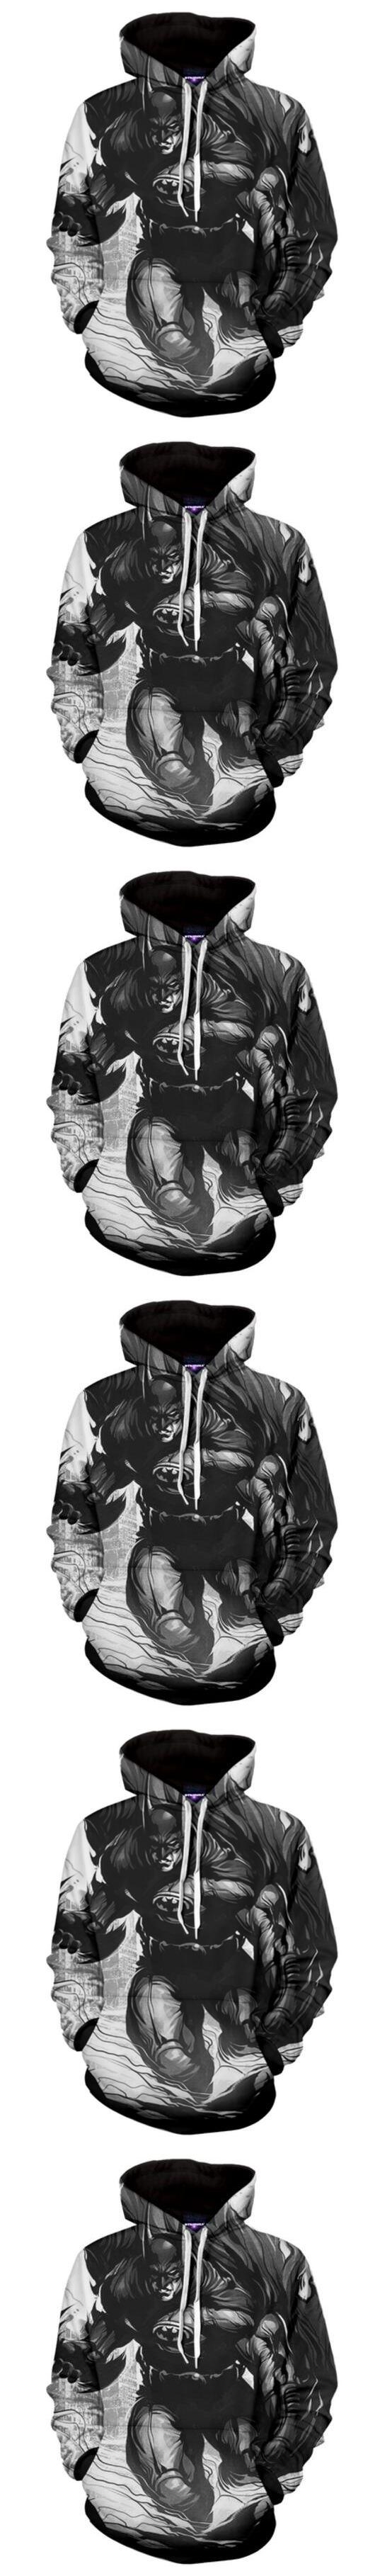 2017 NEW FASHION MEN WOMEN white dark grey Bat M HOODIE 3D Hoodie Sweatshirts Pullovers Autumn Tracksuit Winter Loose Thin Hoody